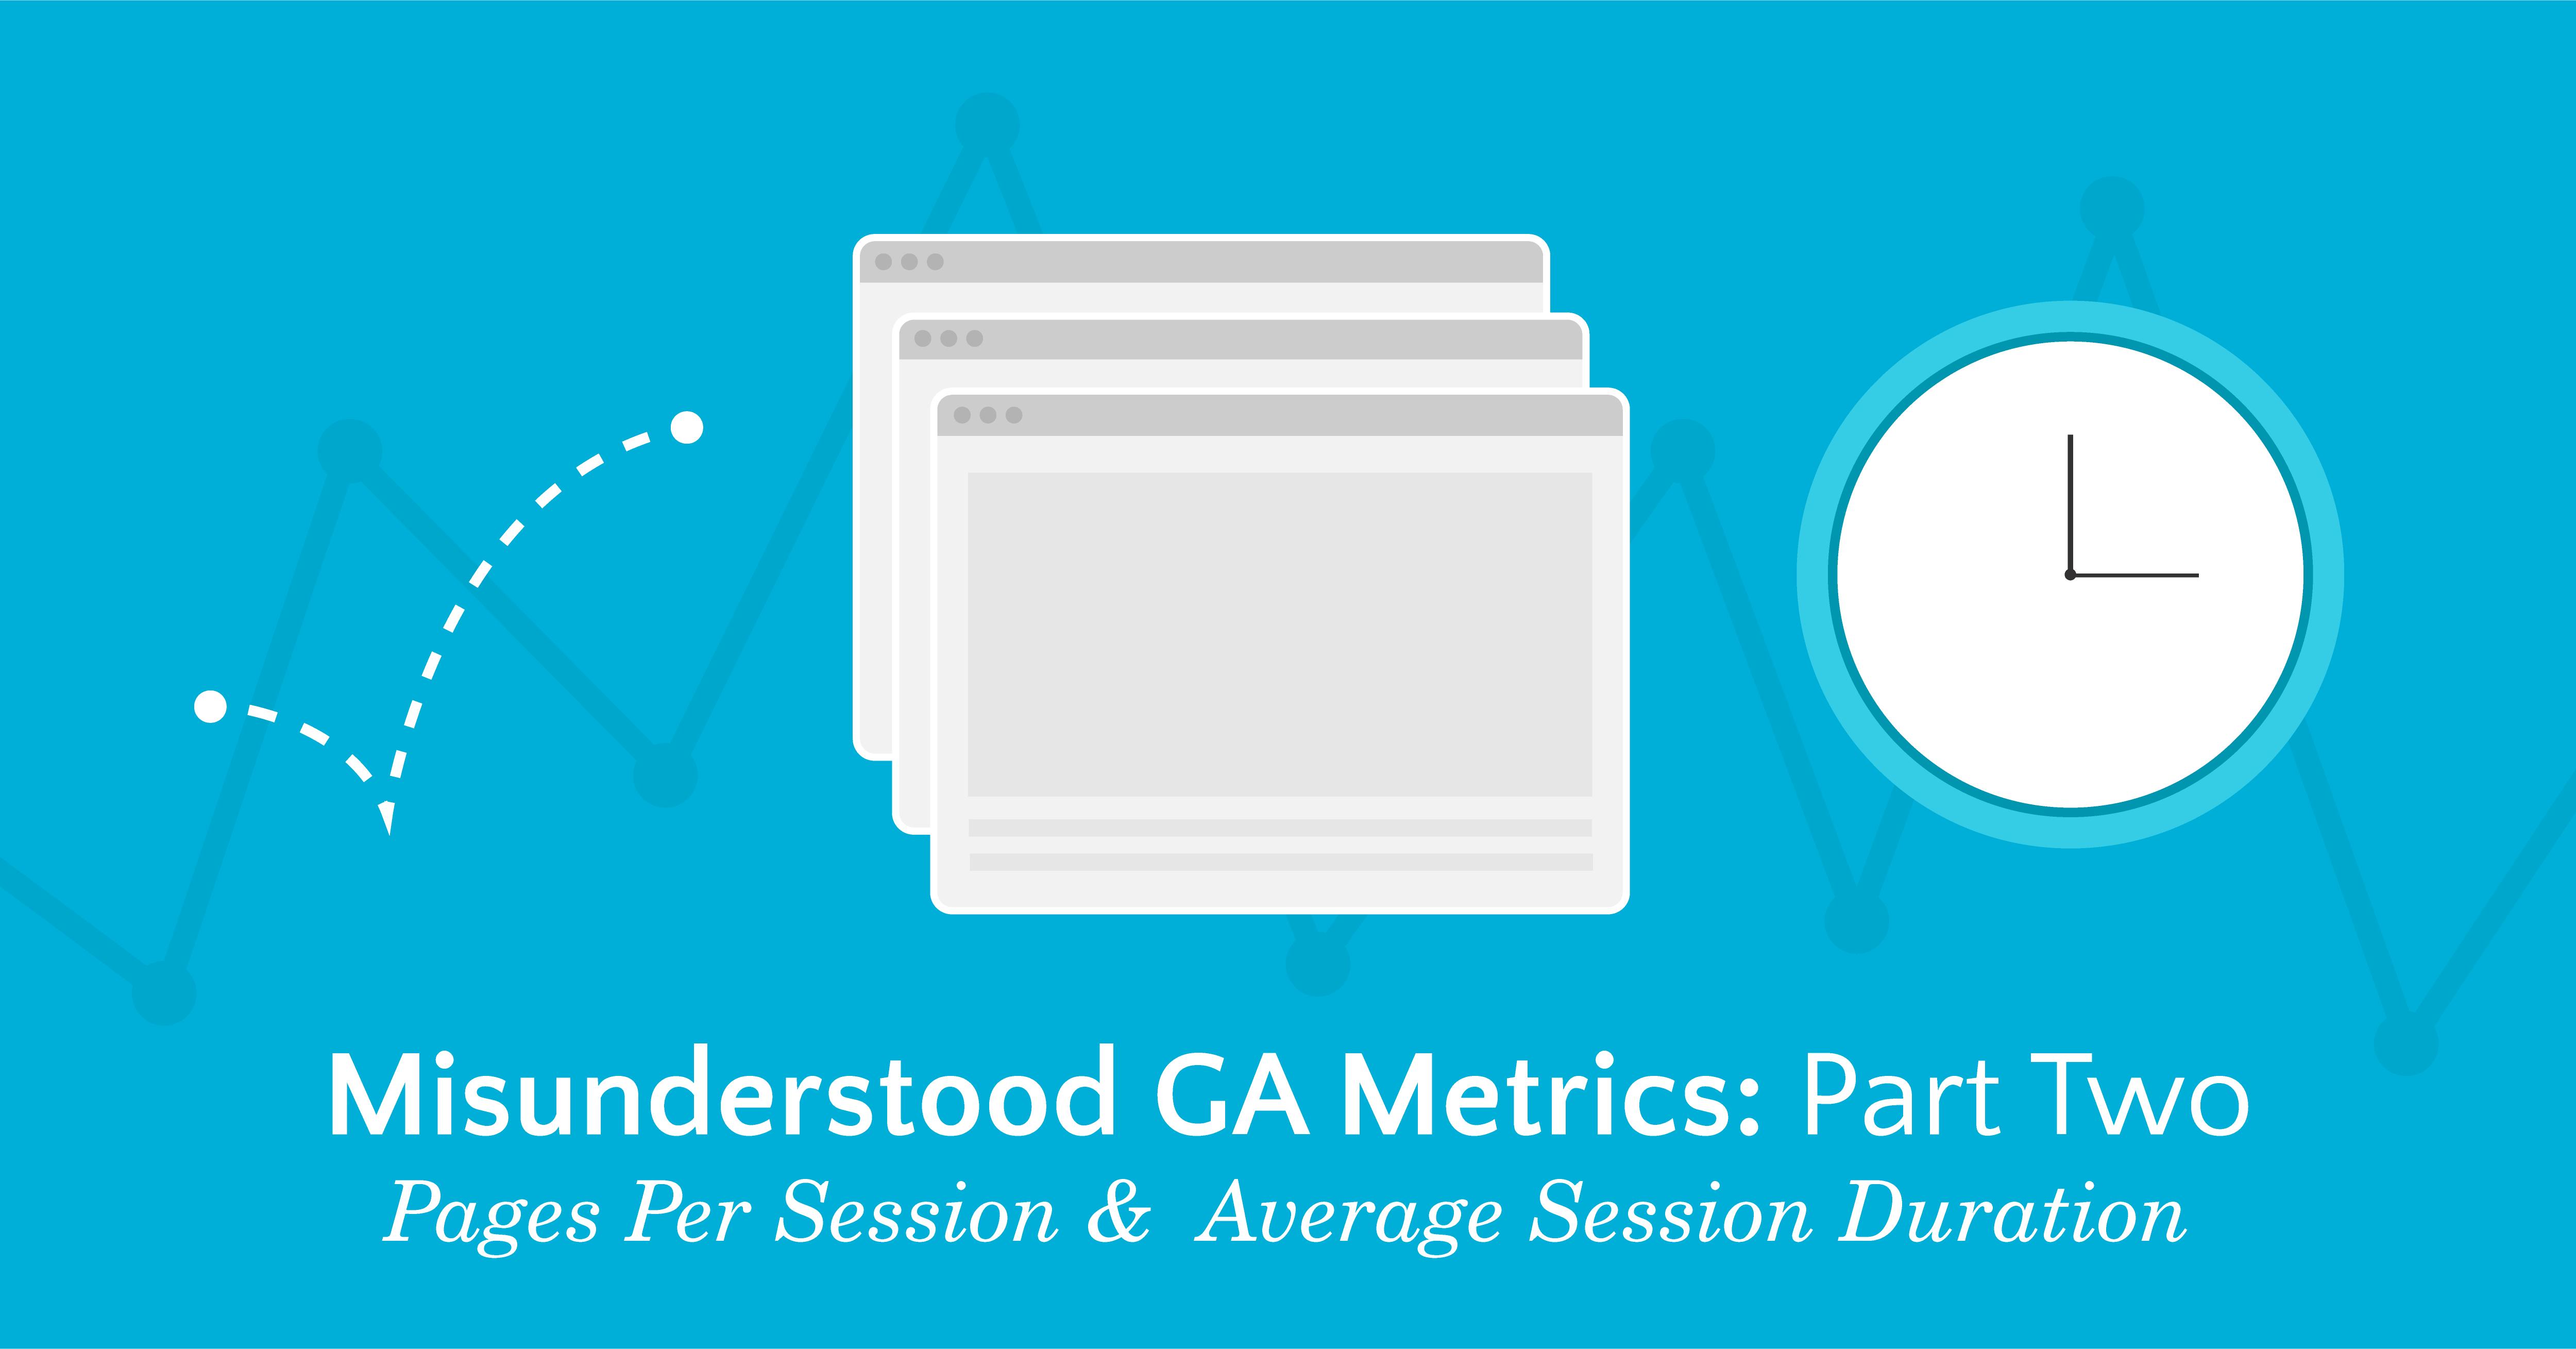 Blog Misunderstood GA Metrics PT2-06.png